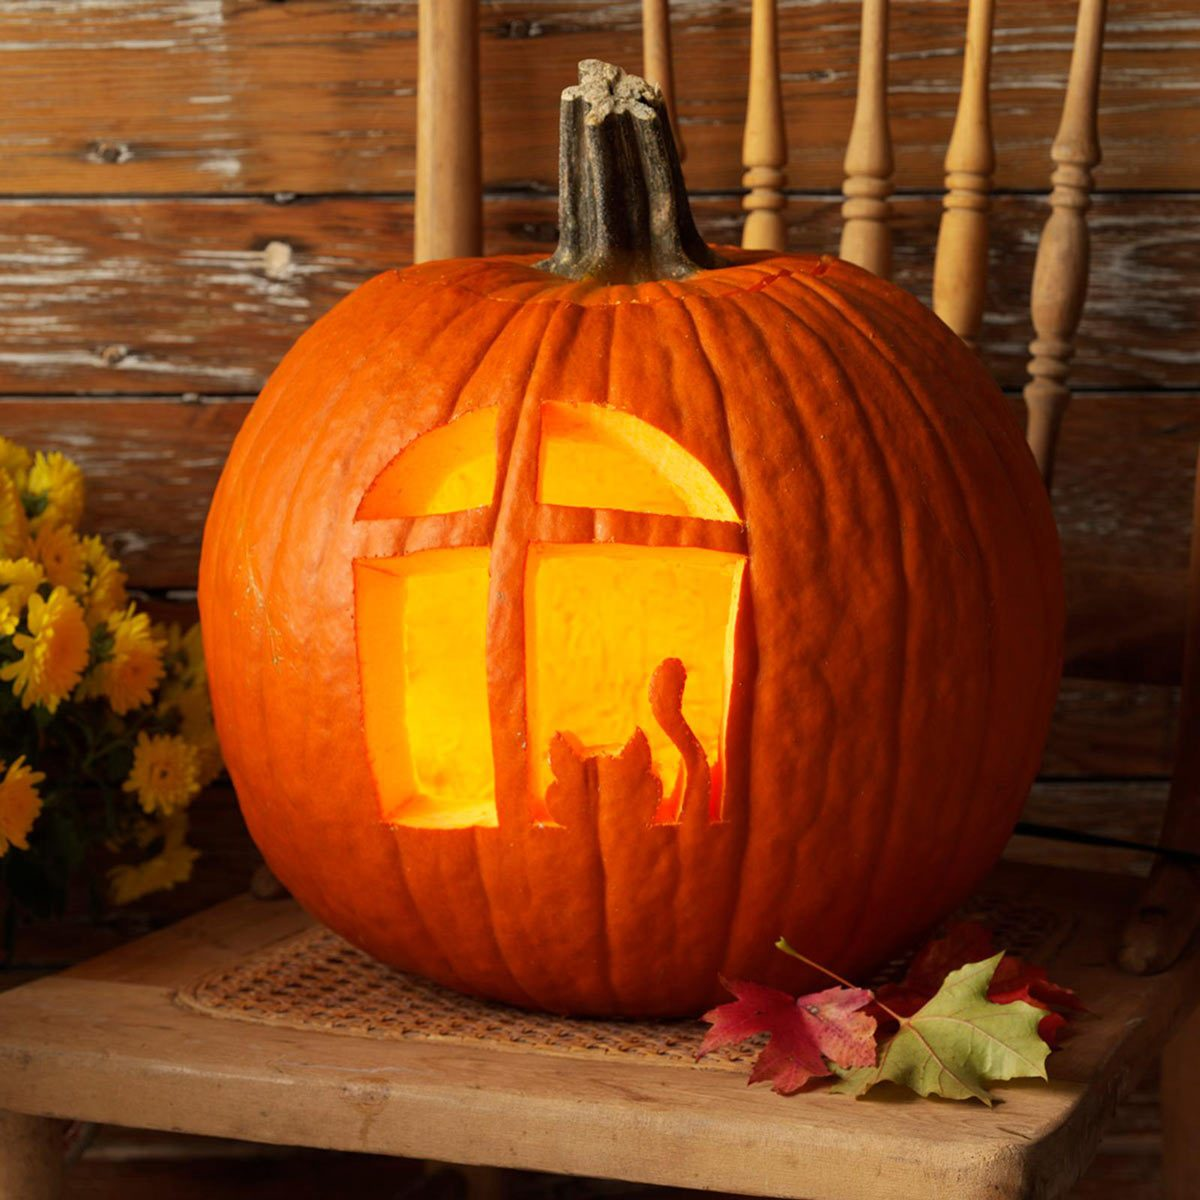 cat in the window halloween pumpkin carving jack o'lantern